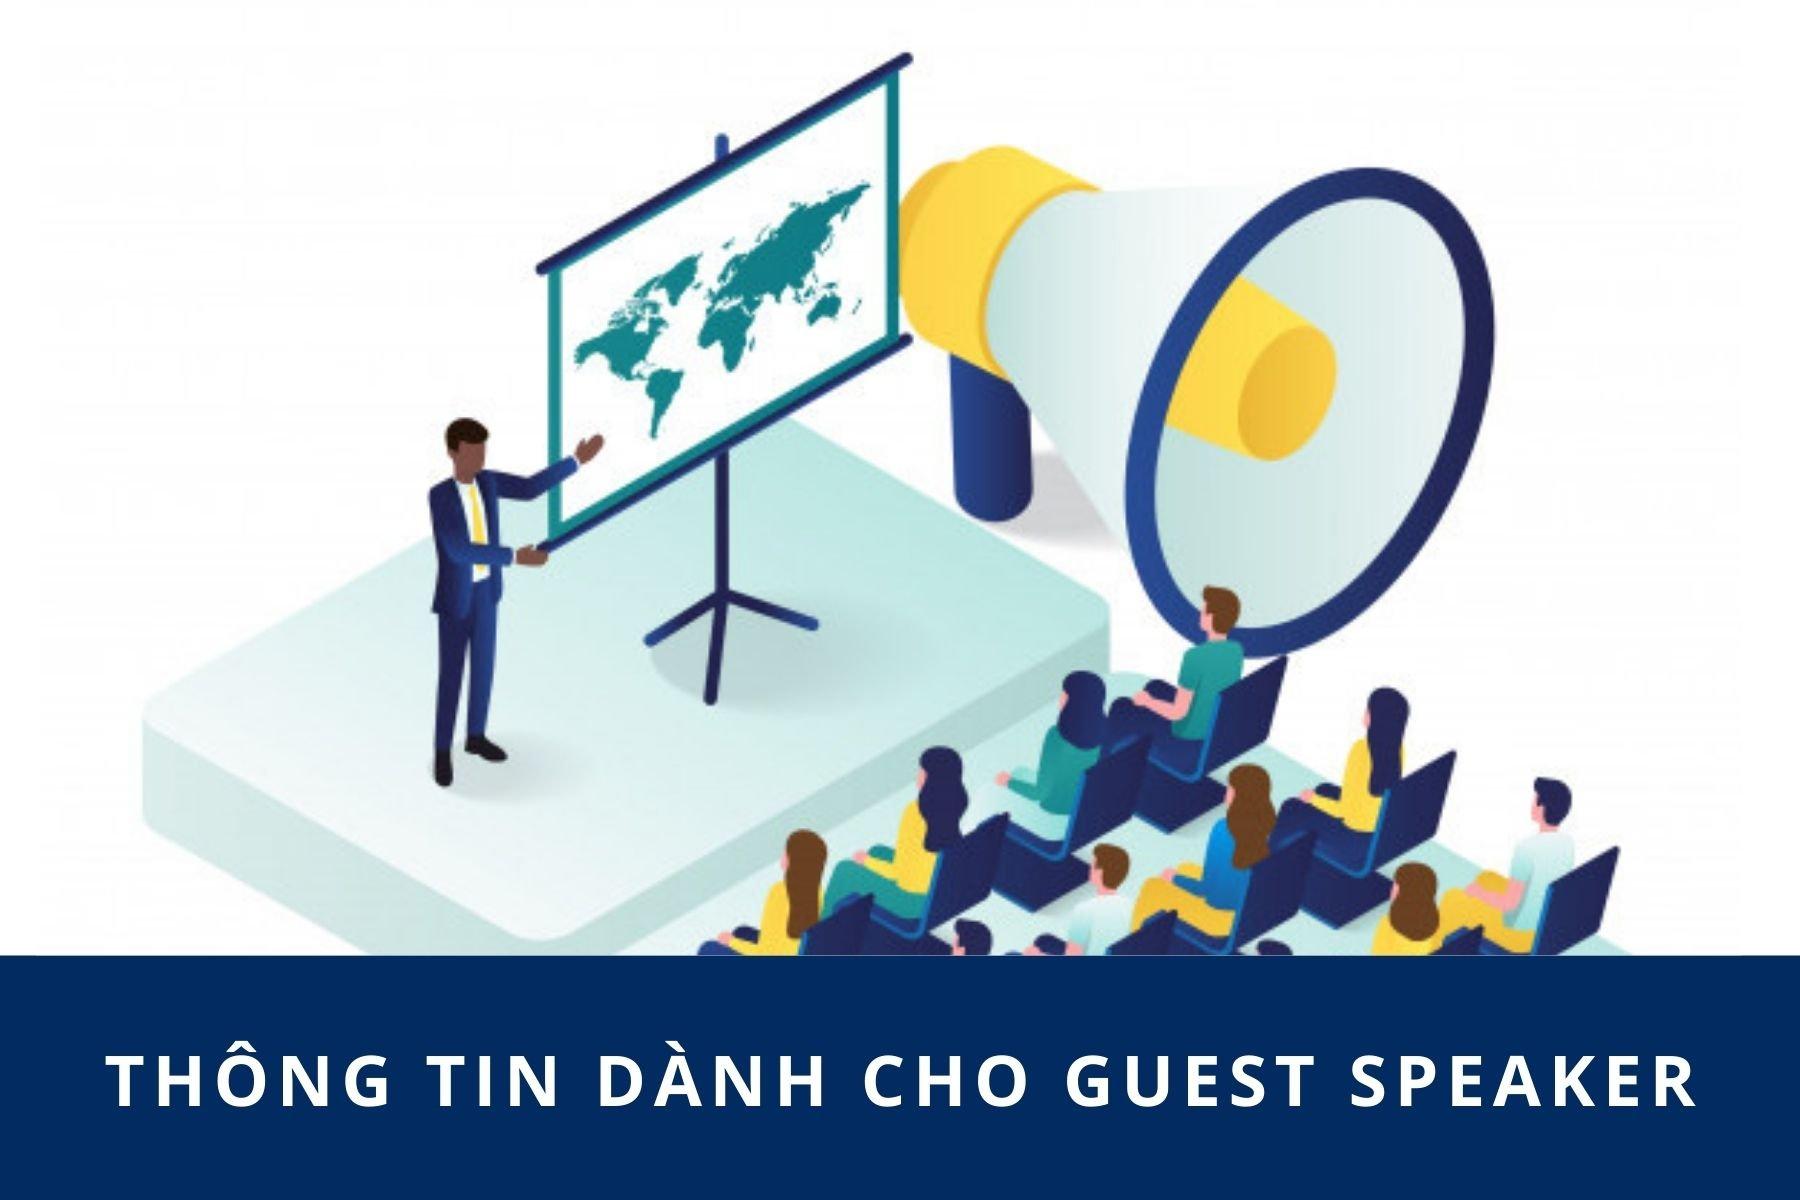 Thong tin danh cho Guest Speaker